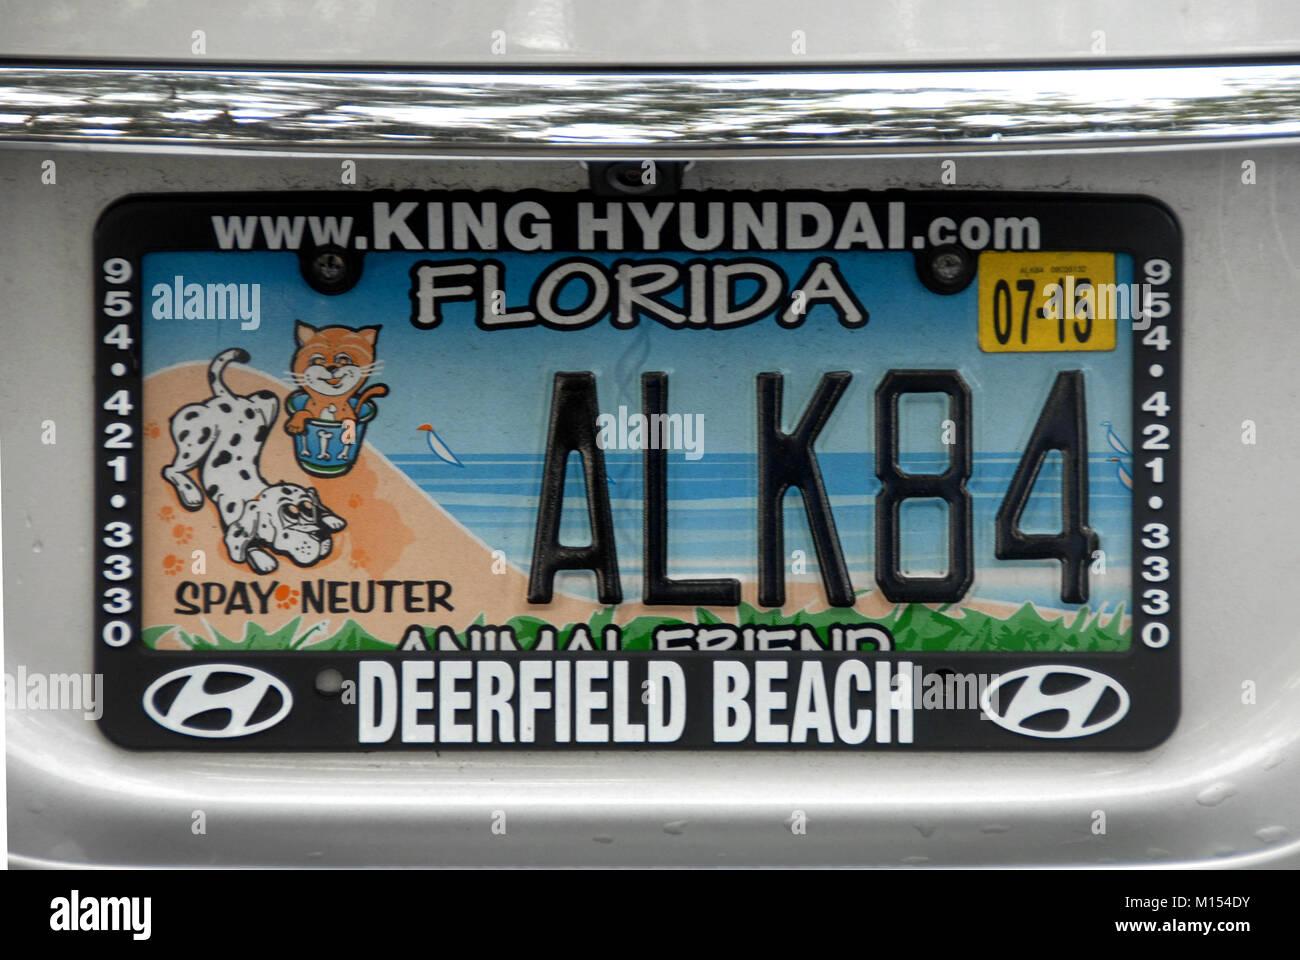 Florida Number Plate Stockfotos & Florida Number Plate Bilder - Alamy